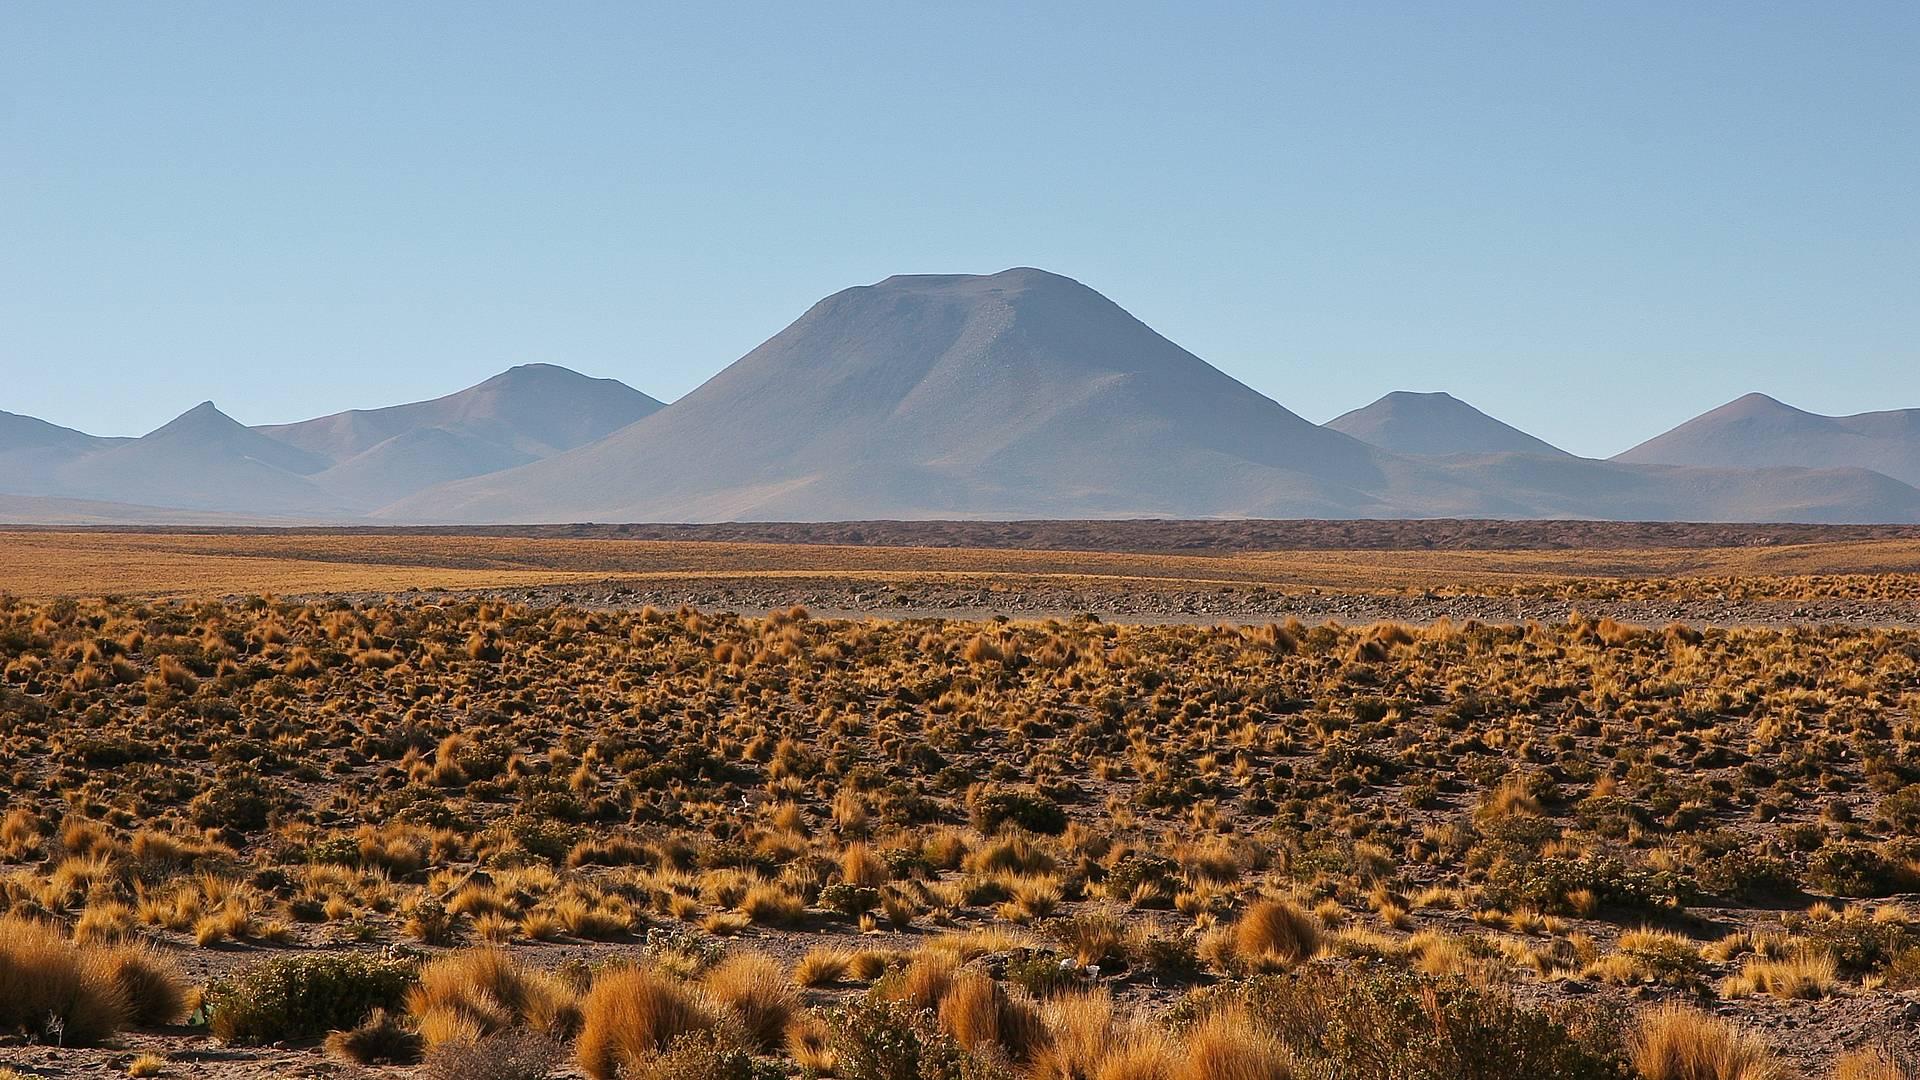 Self-drive da Santiago al deserto di Atacama